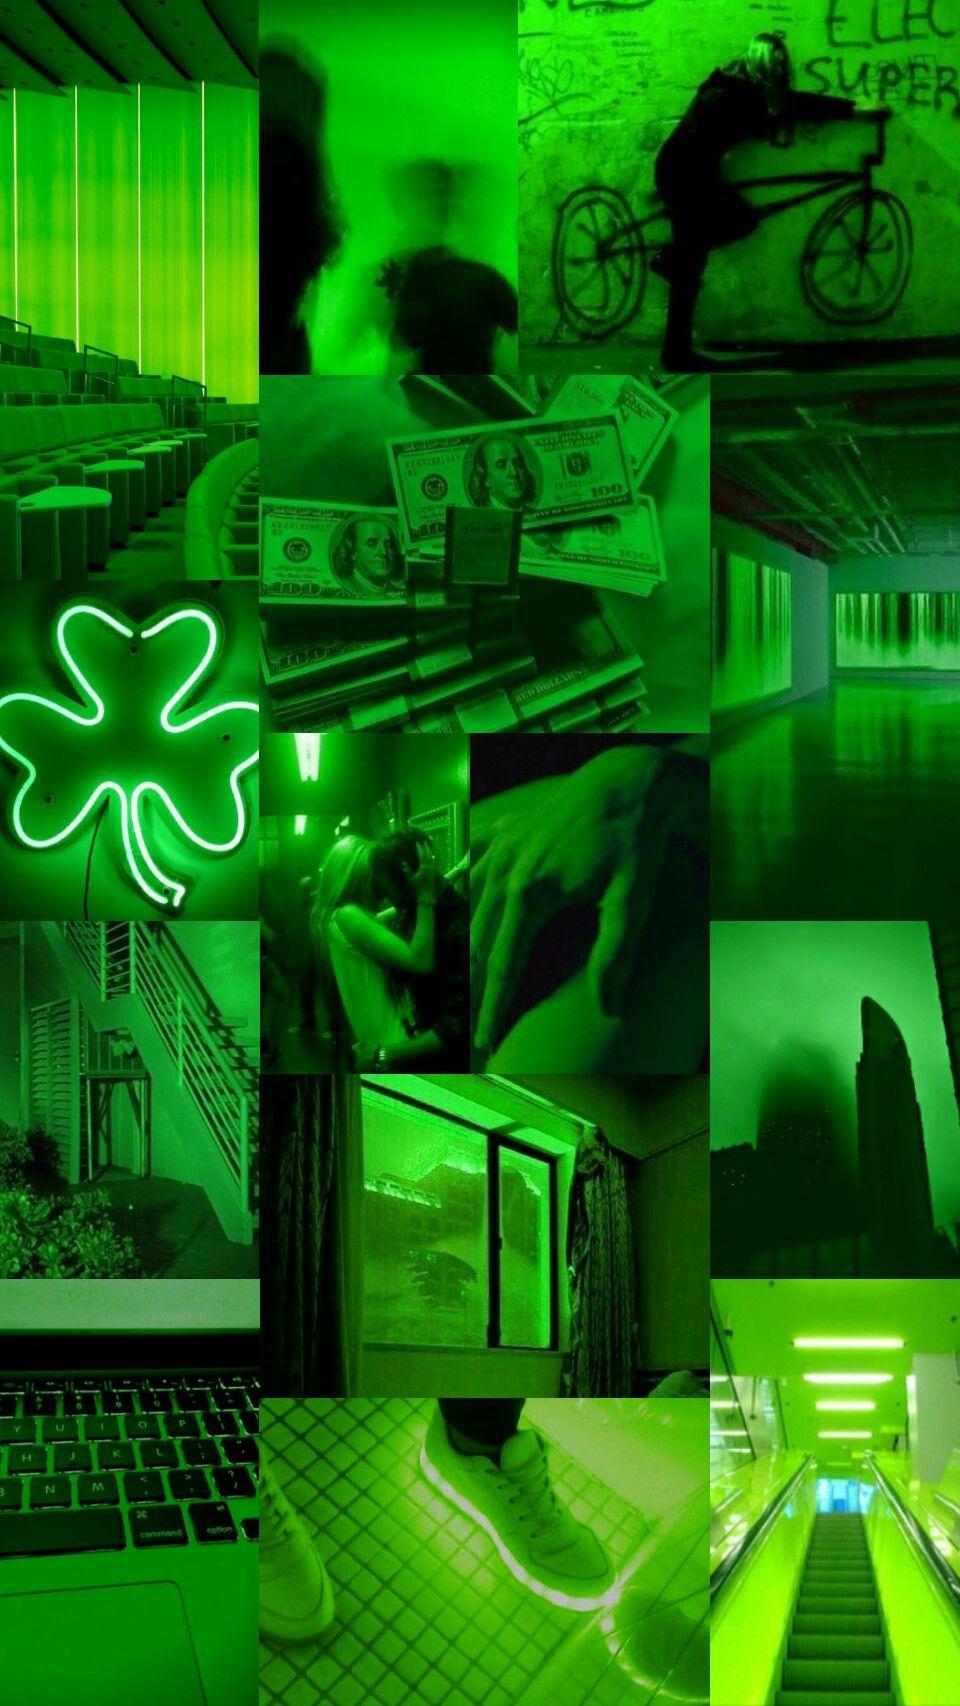 Green aesthetic wallpaper / lockscreen | Lock screen ...